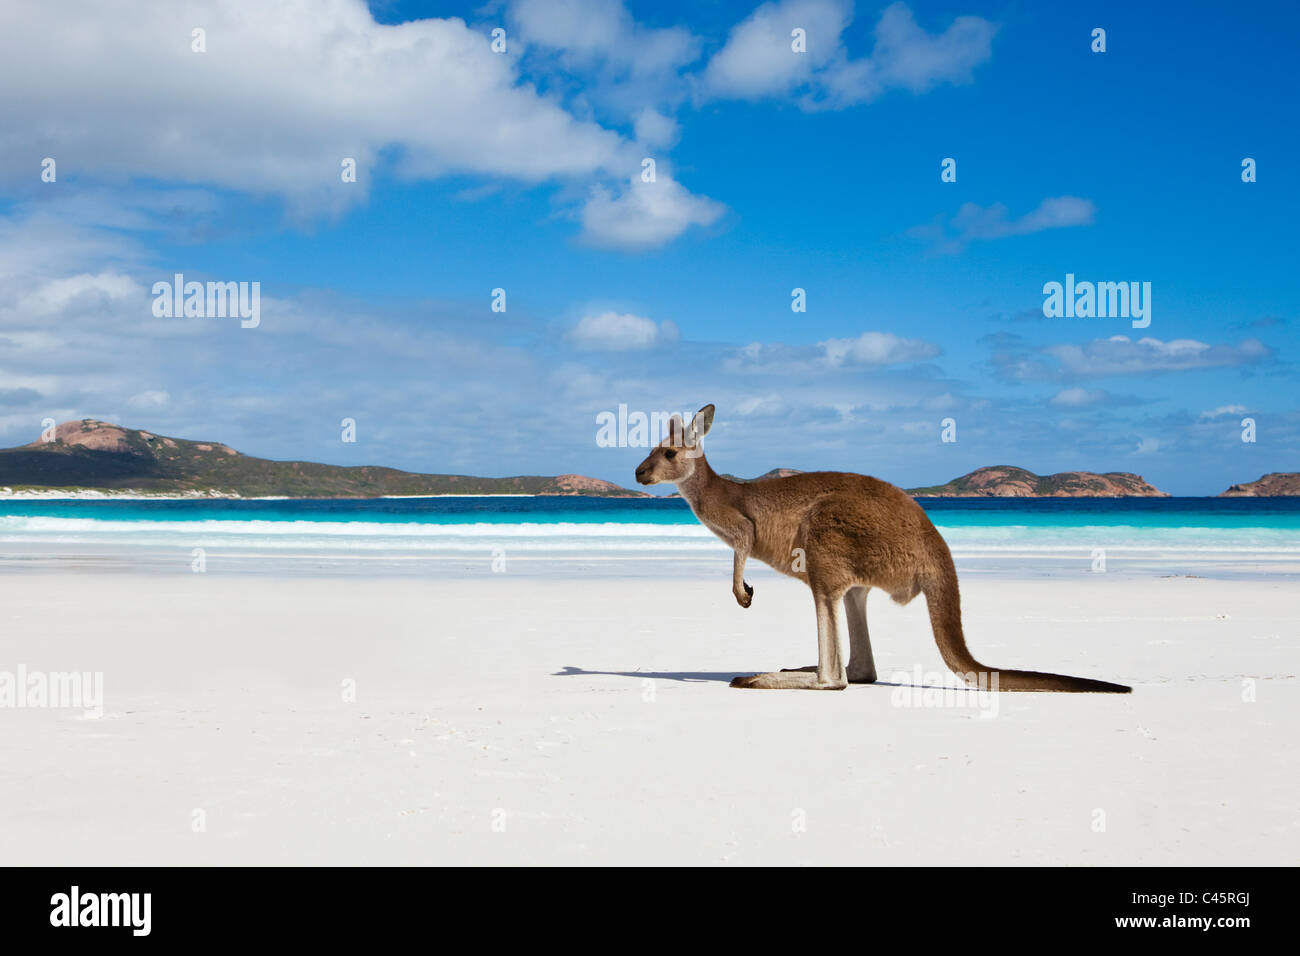 Känguru am Strand von Lucky Bay.  Cape Le Grand Nationalpark, Esperance, Western Australia, Australien Stockfoto